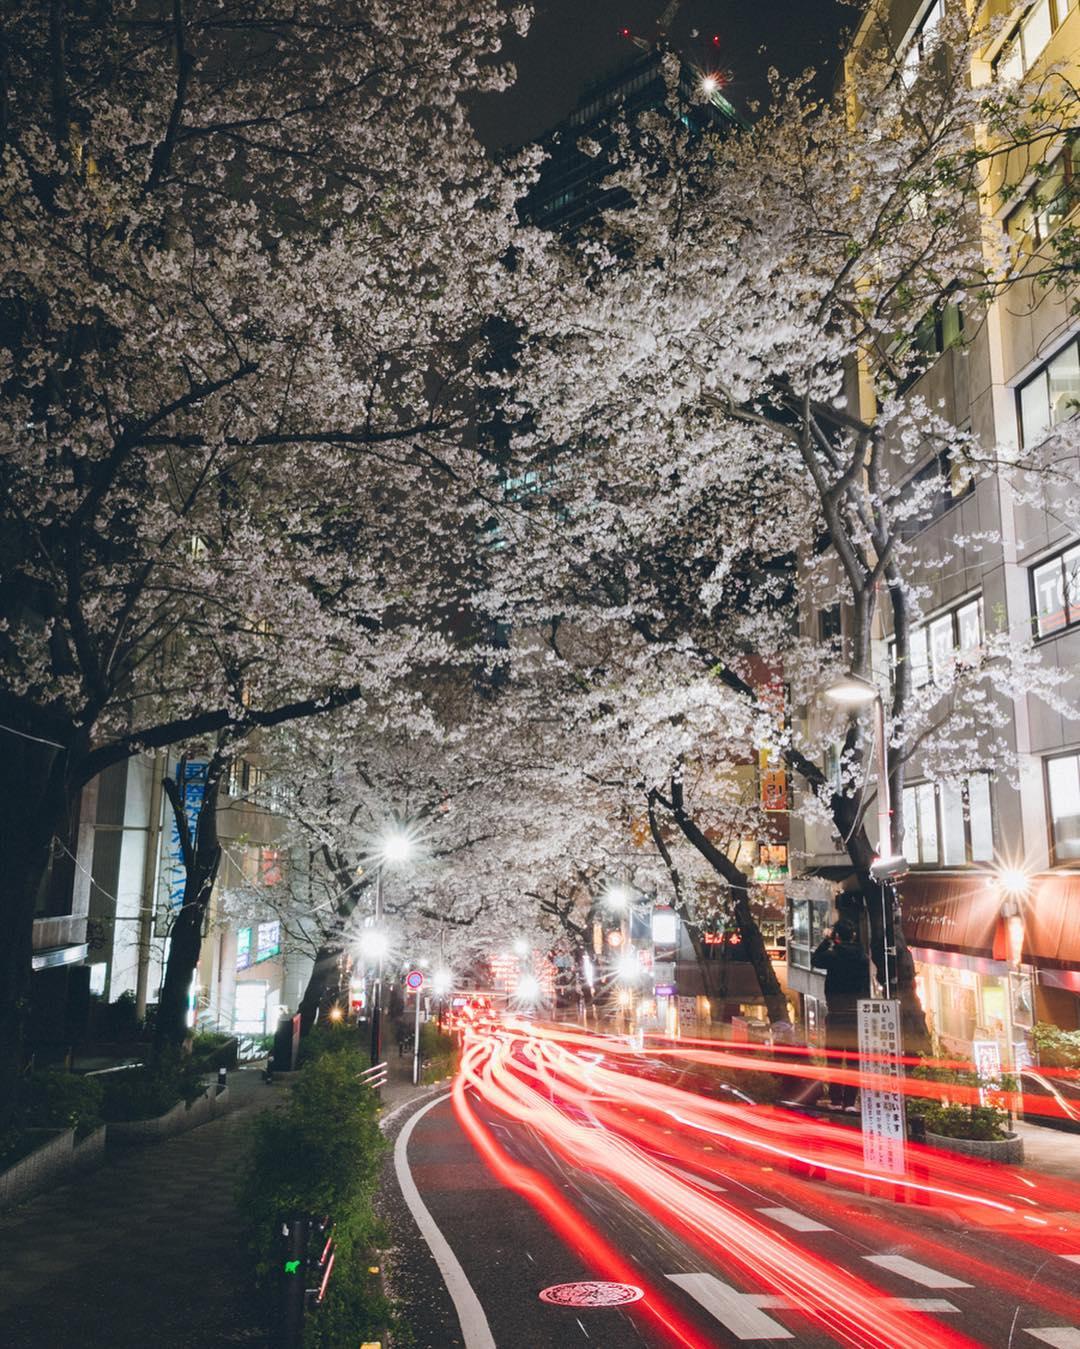 Волшебная Япония на снимках Юма Ямашиты